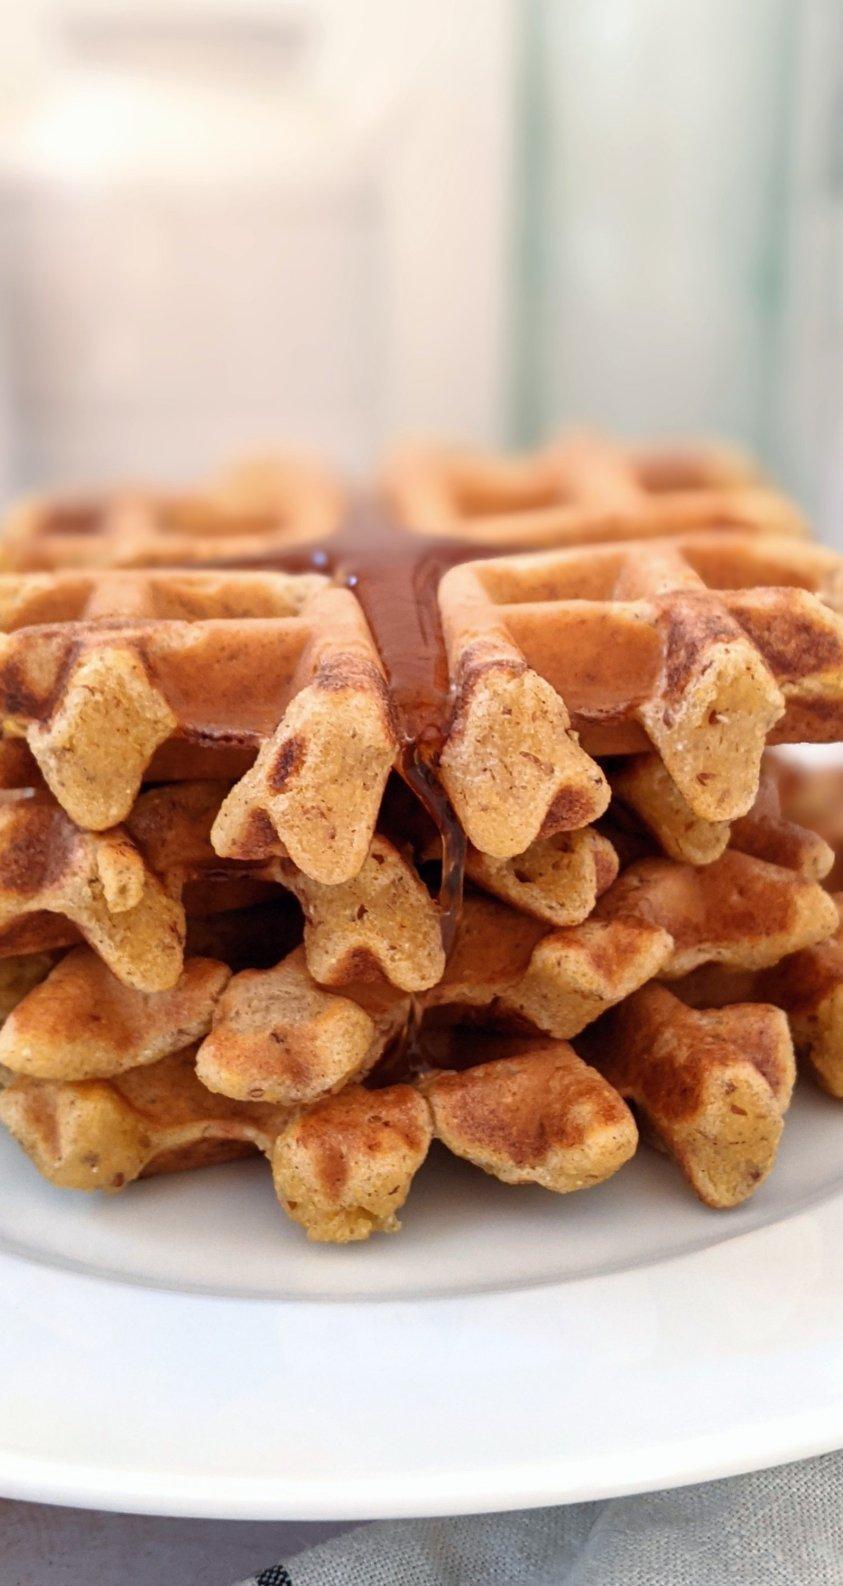 corn meal in waffles recipe vegan dairy free fluffy waffles with corn meal no yeast waffles easy 15 minute breakfast recipes